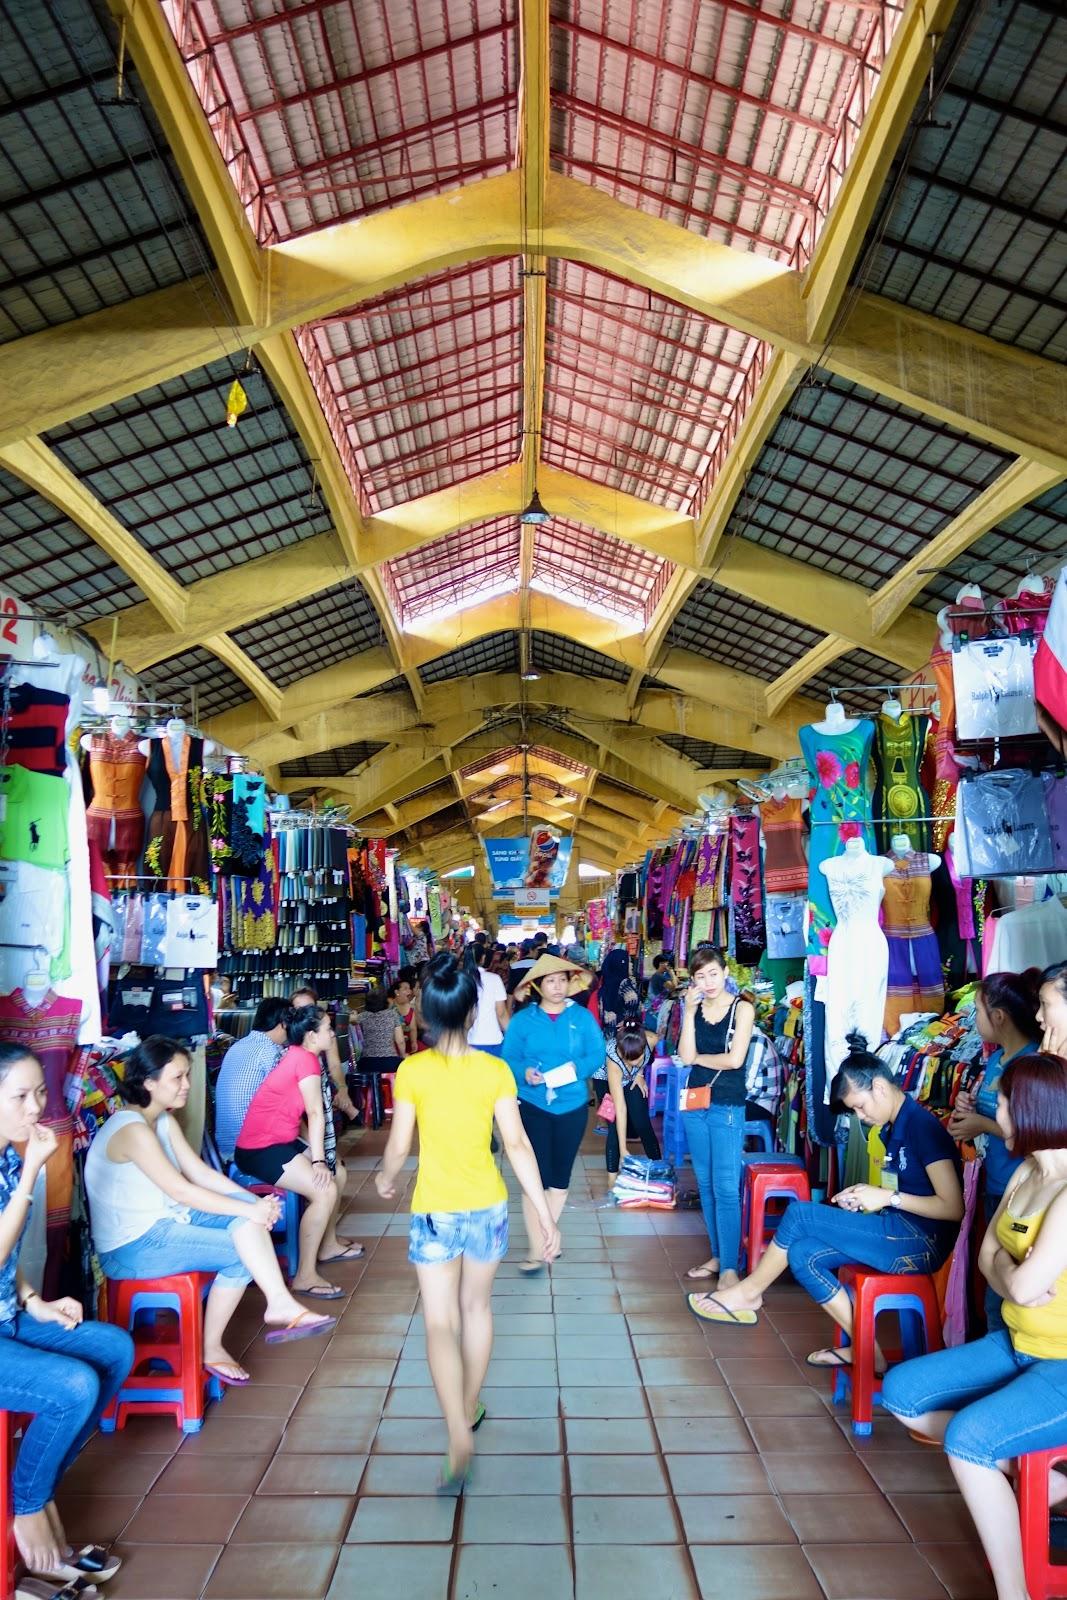 Cho Ben Thanh Market Vietnam 2015